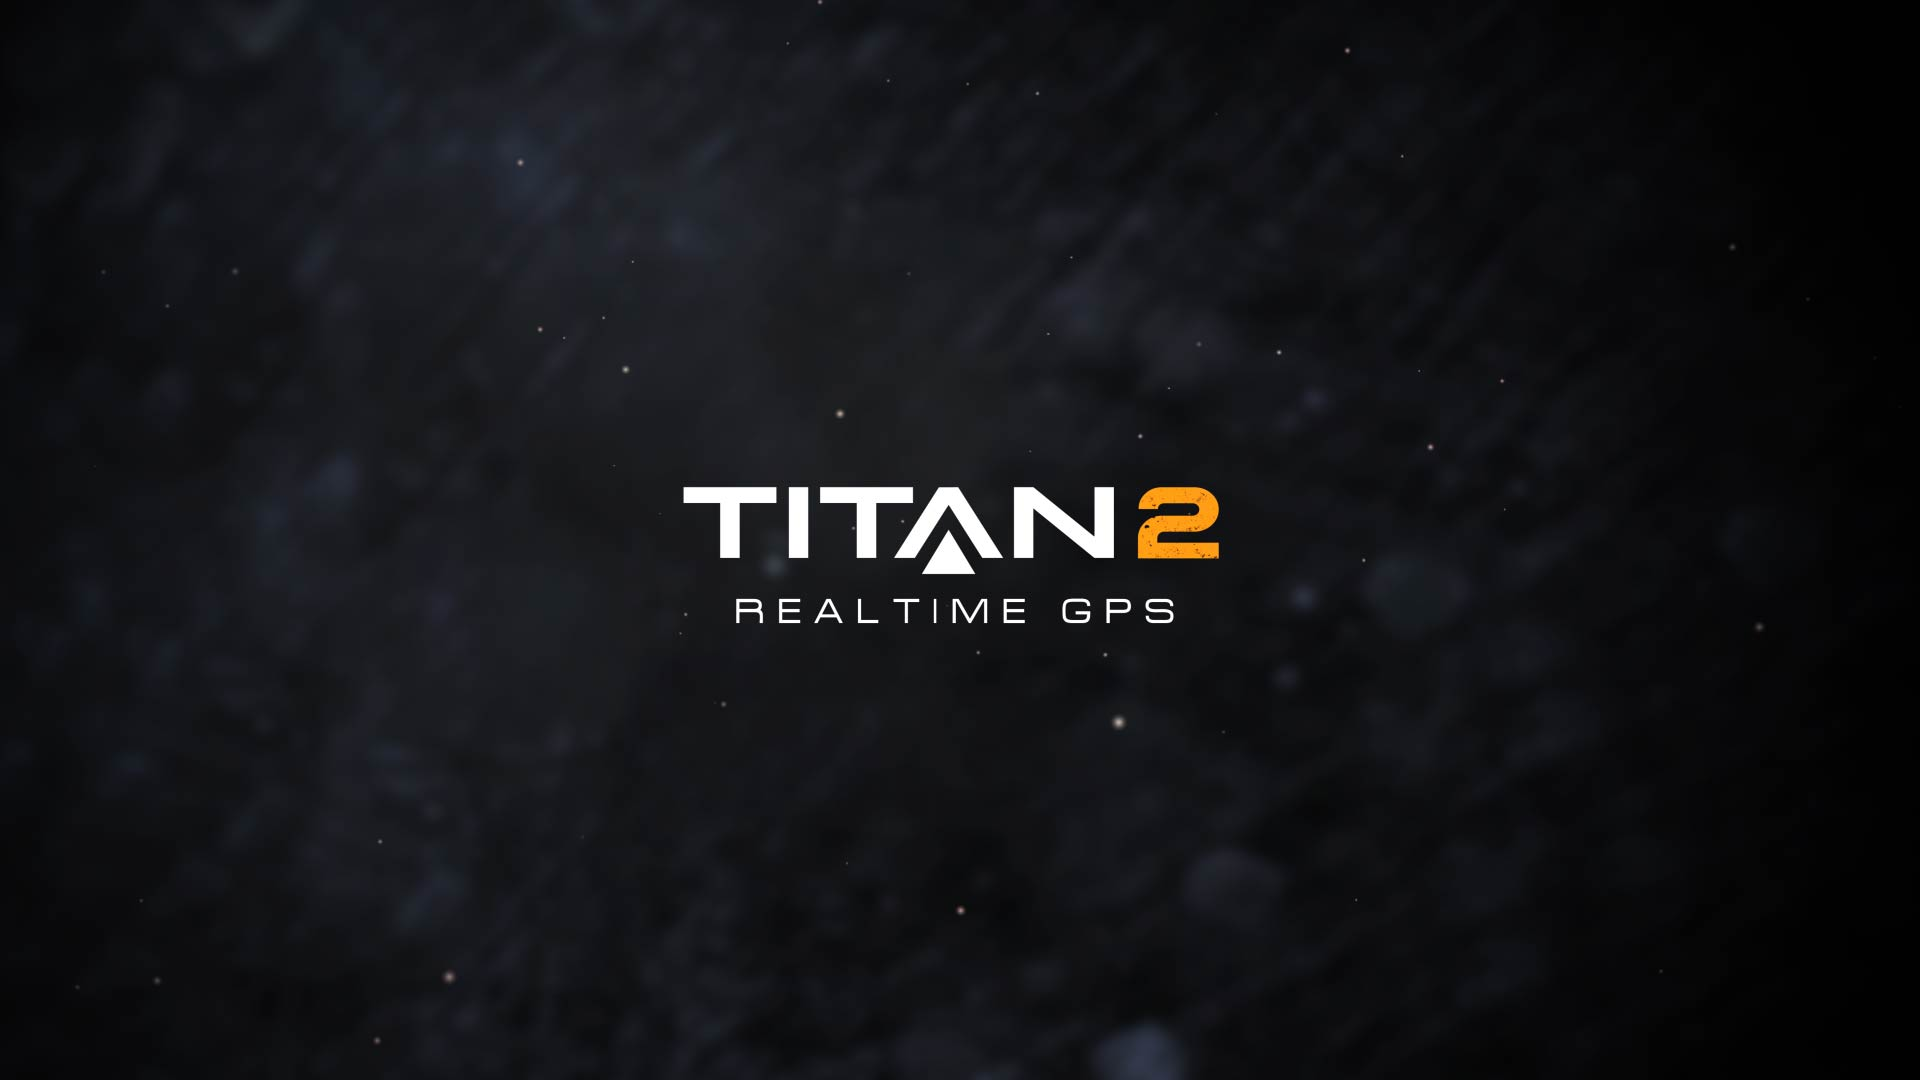 TITAN2_Title2